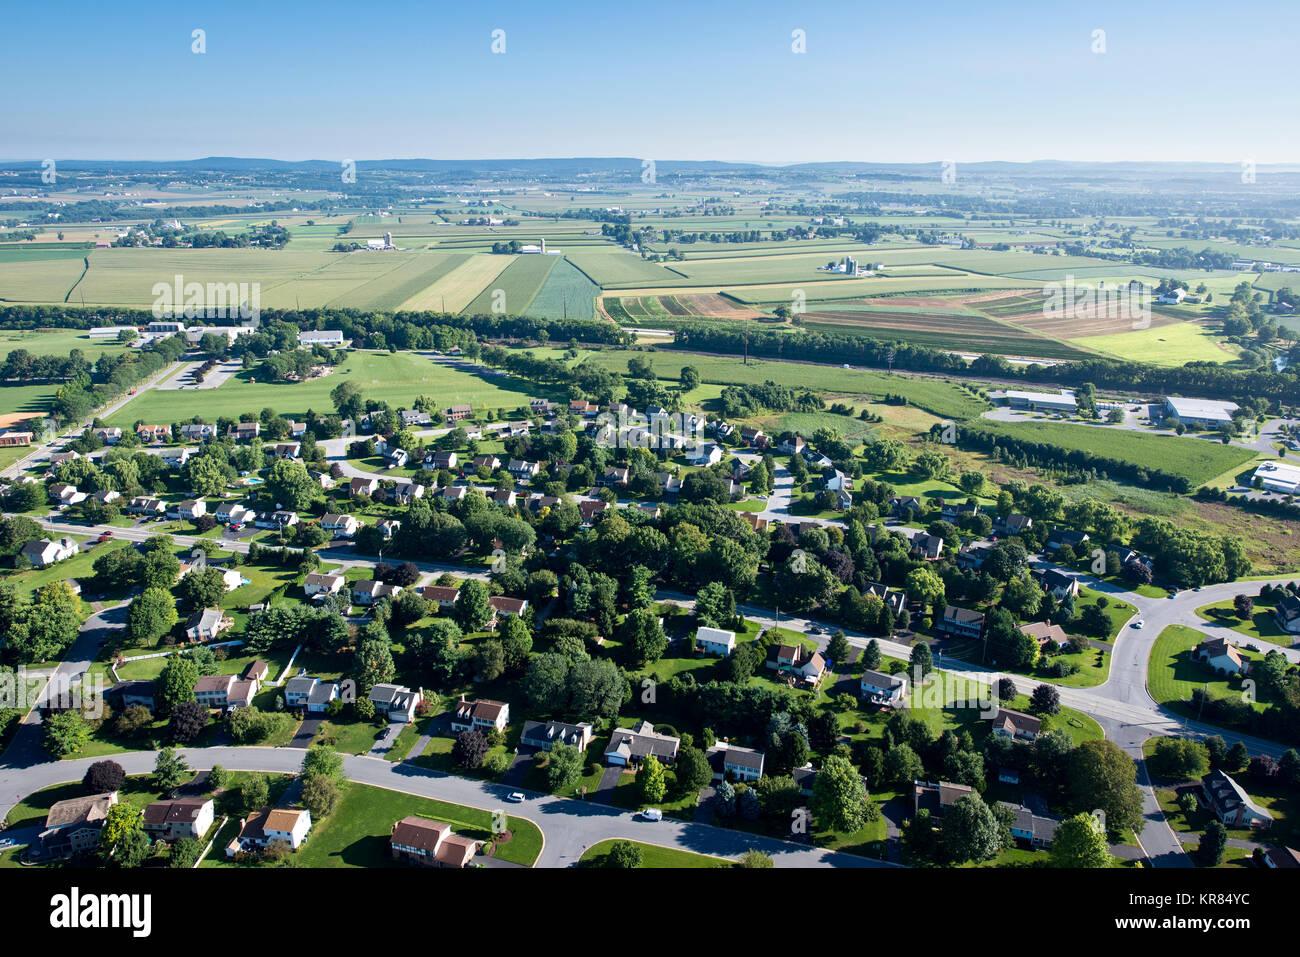 AERIAL VIEW OF SUBURBAN SPRAWL,LANCASTER PENNSYLVANIA - Stock Image